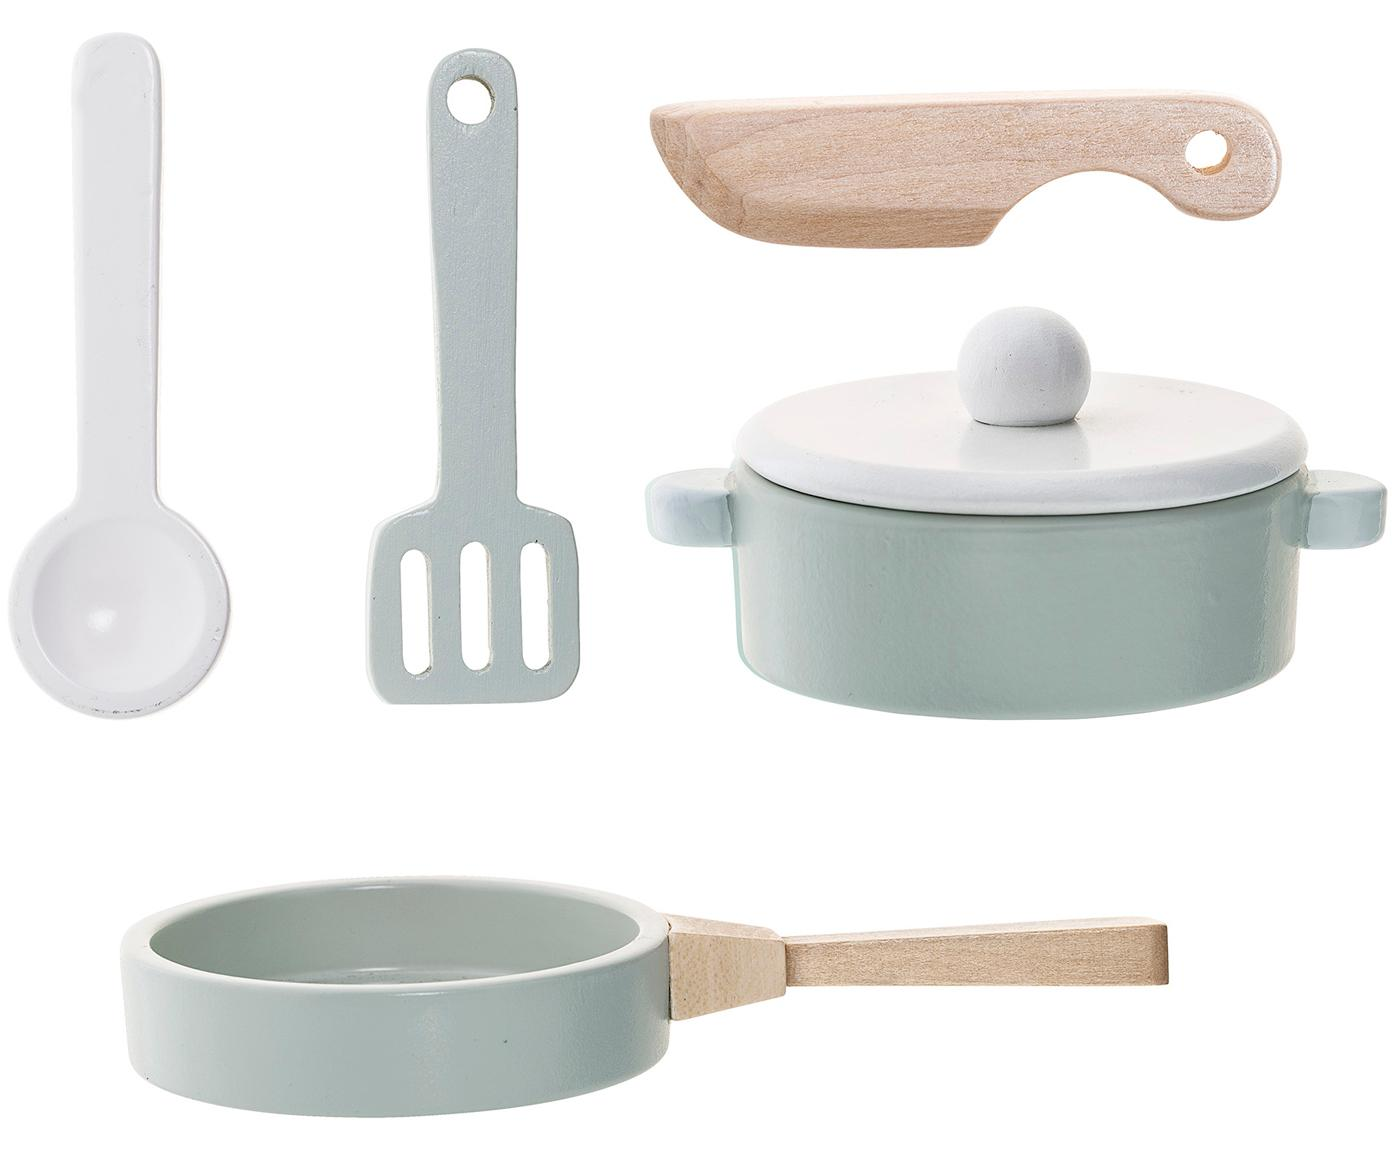 Set de juguetes Cooking, 5pzas., Tablero de fibras de densidad media (MDF), madera de schima, Azul, Tamaños diferentes